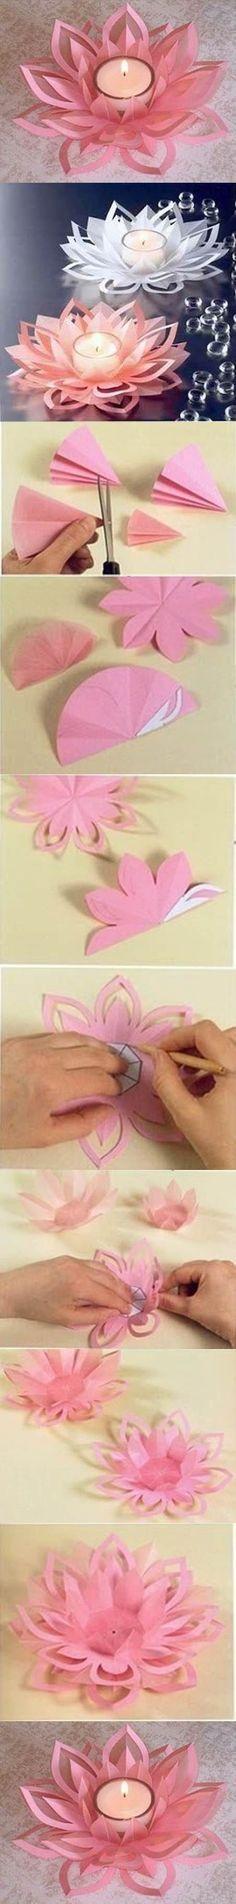 DIY Paper Lotus Candlestick | iCreativeIdeas.com Like Us on Facebook ==> https://www.facebook.com/icreativeideas